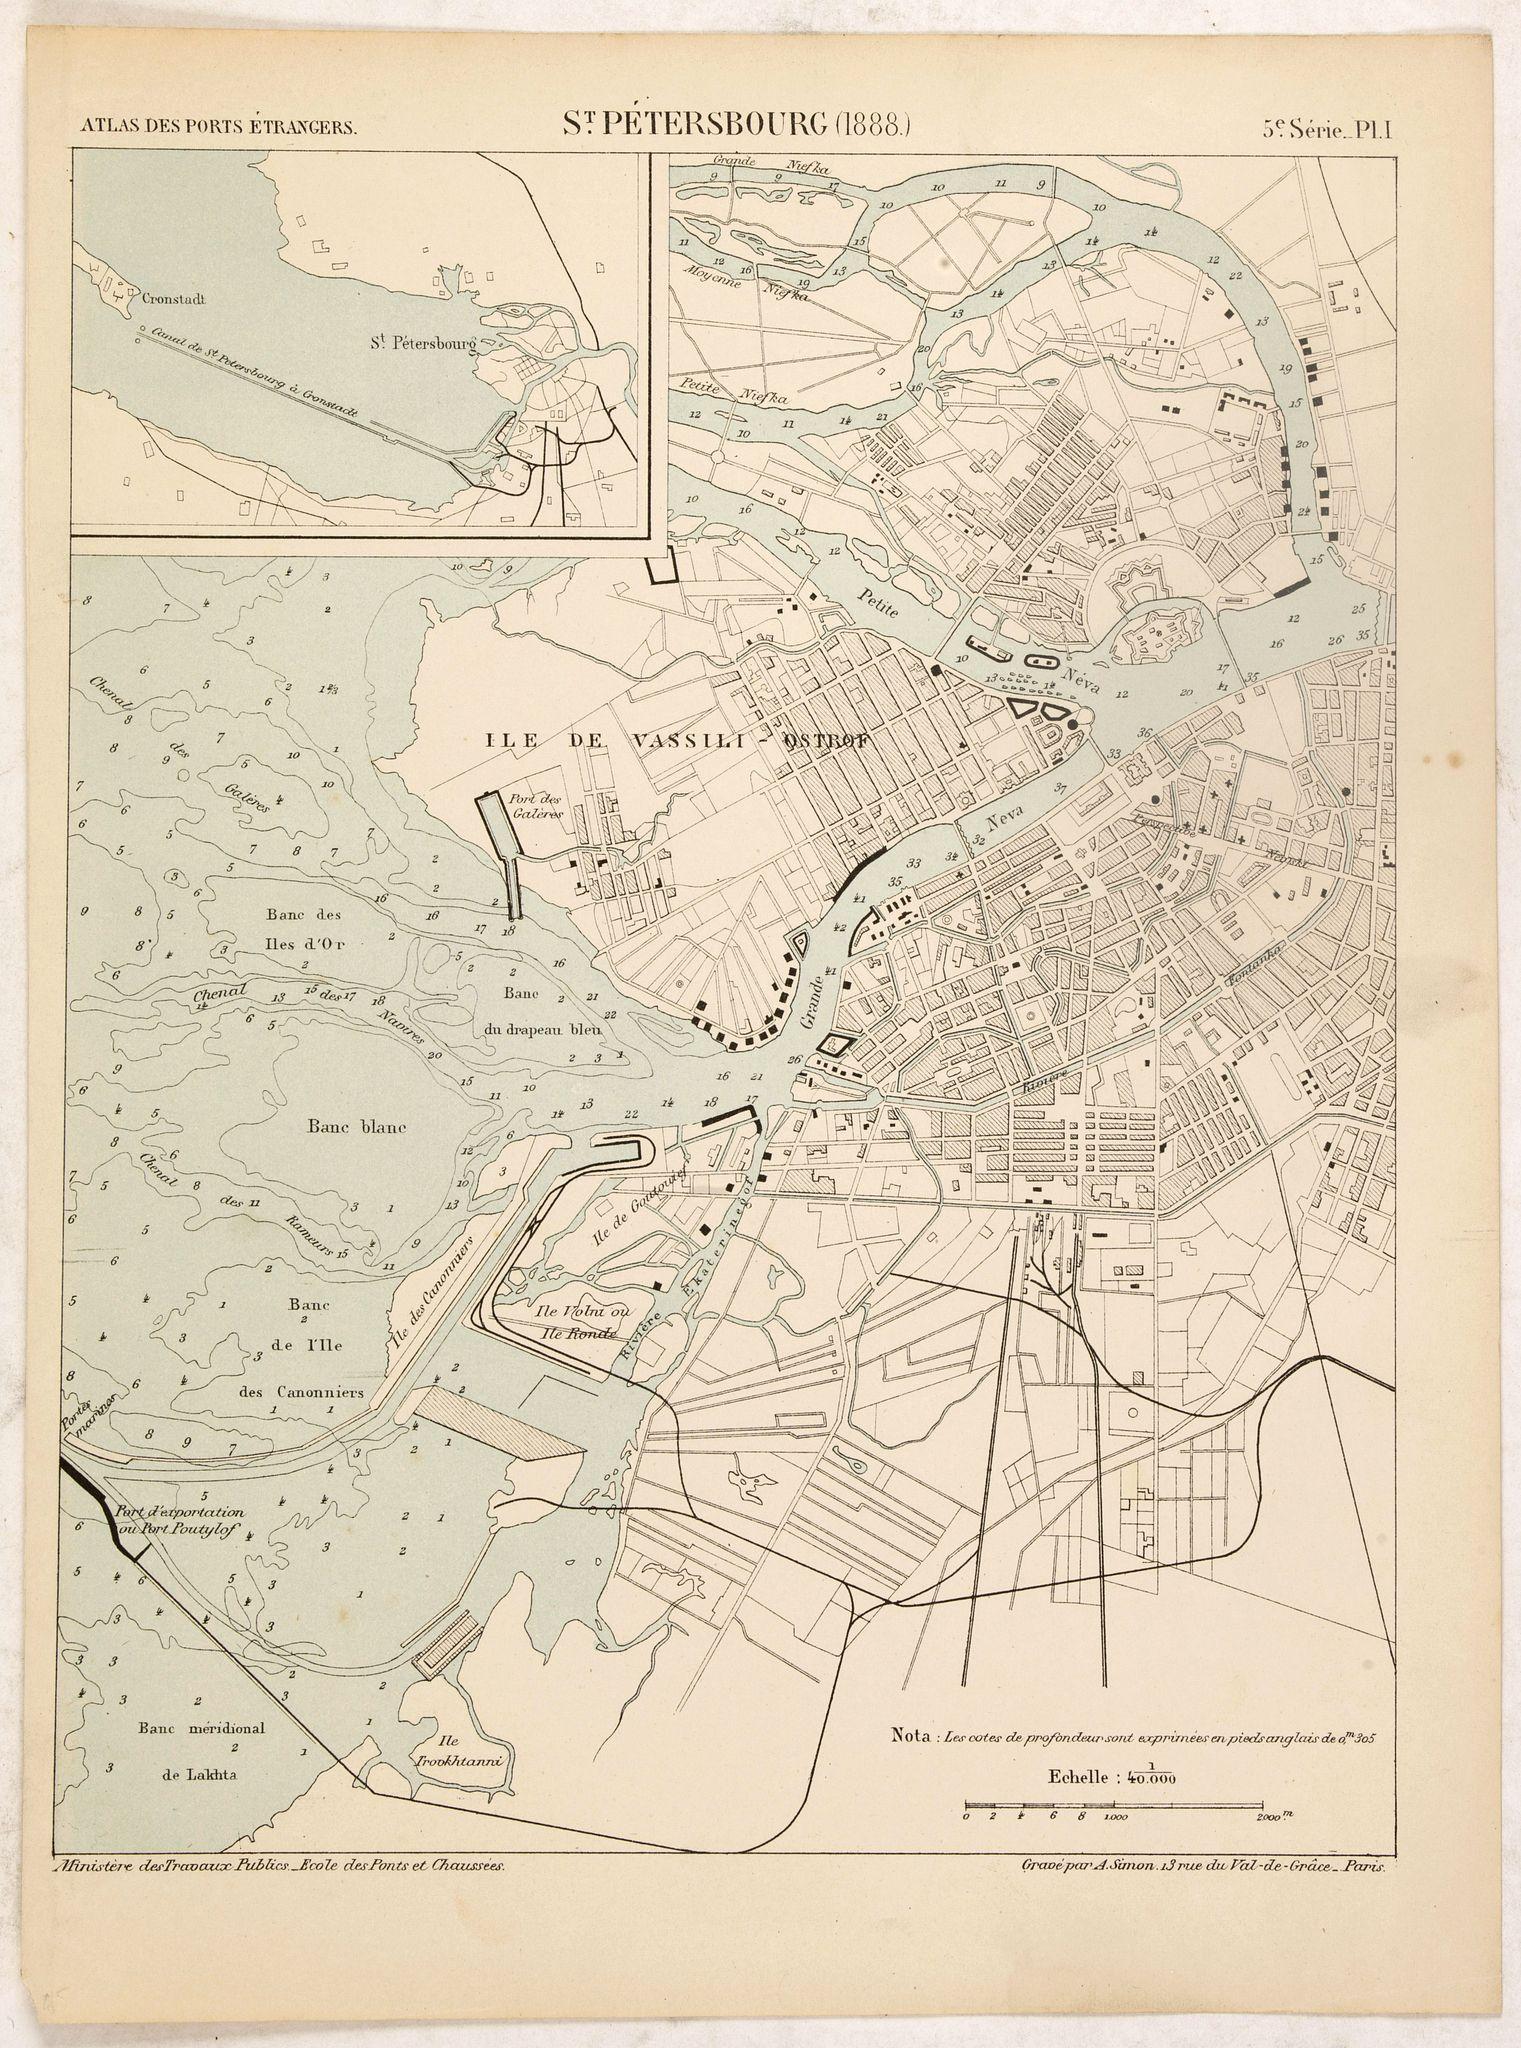 IMPRIMERIE NATIONALE -  St. Pétersbourg (1888).